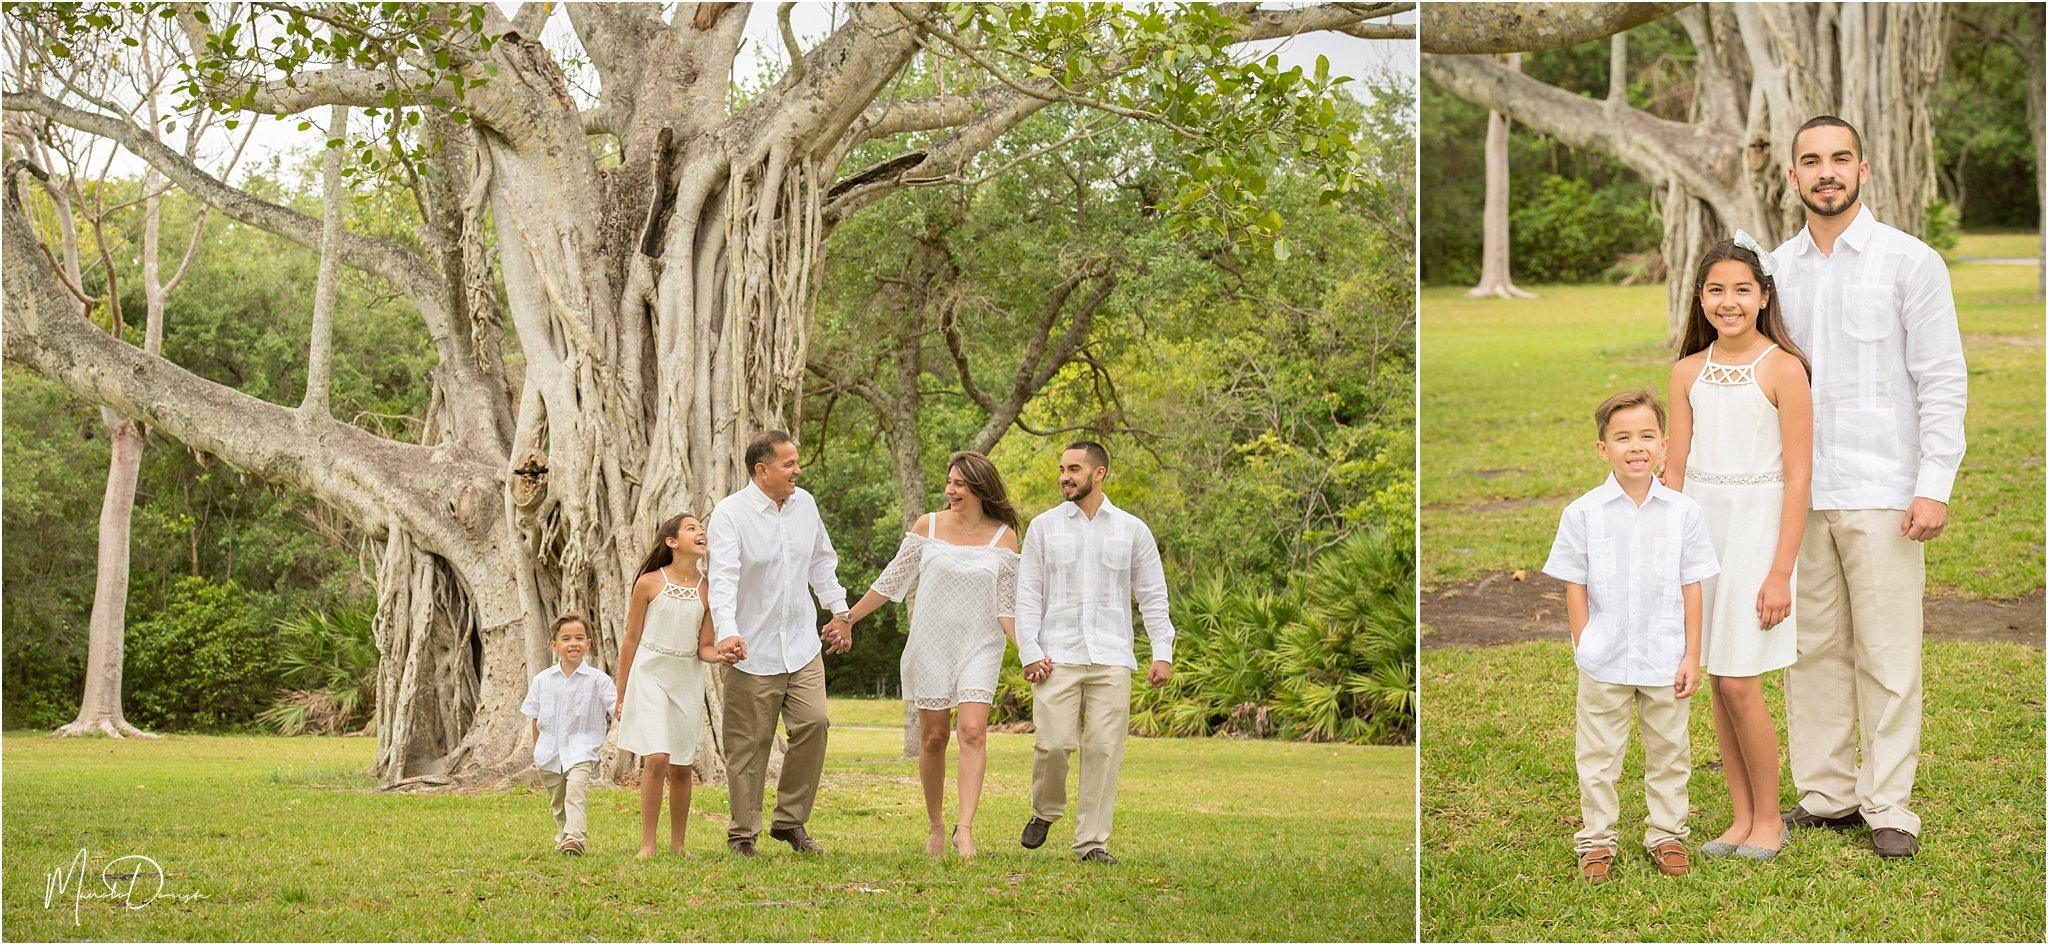 0558_ManoloDoreste_InFocusStudios_Wedding_Family_Photography_Miami_MiamiPhotographer.jpg